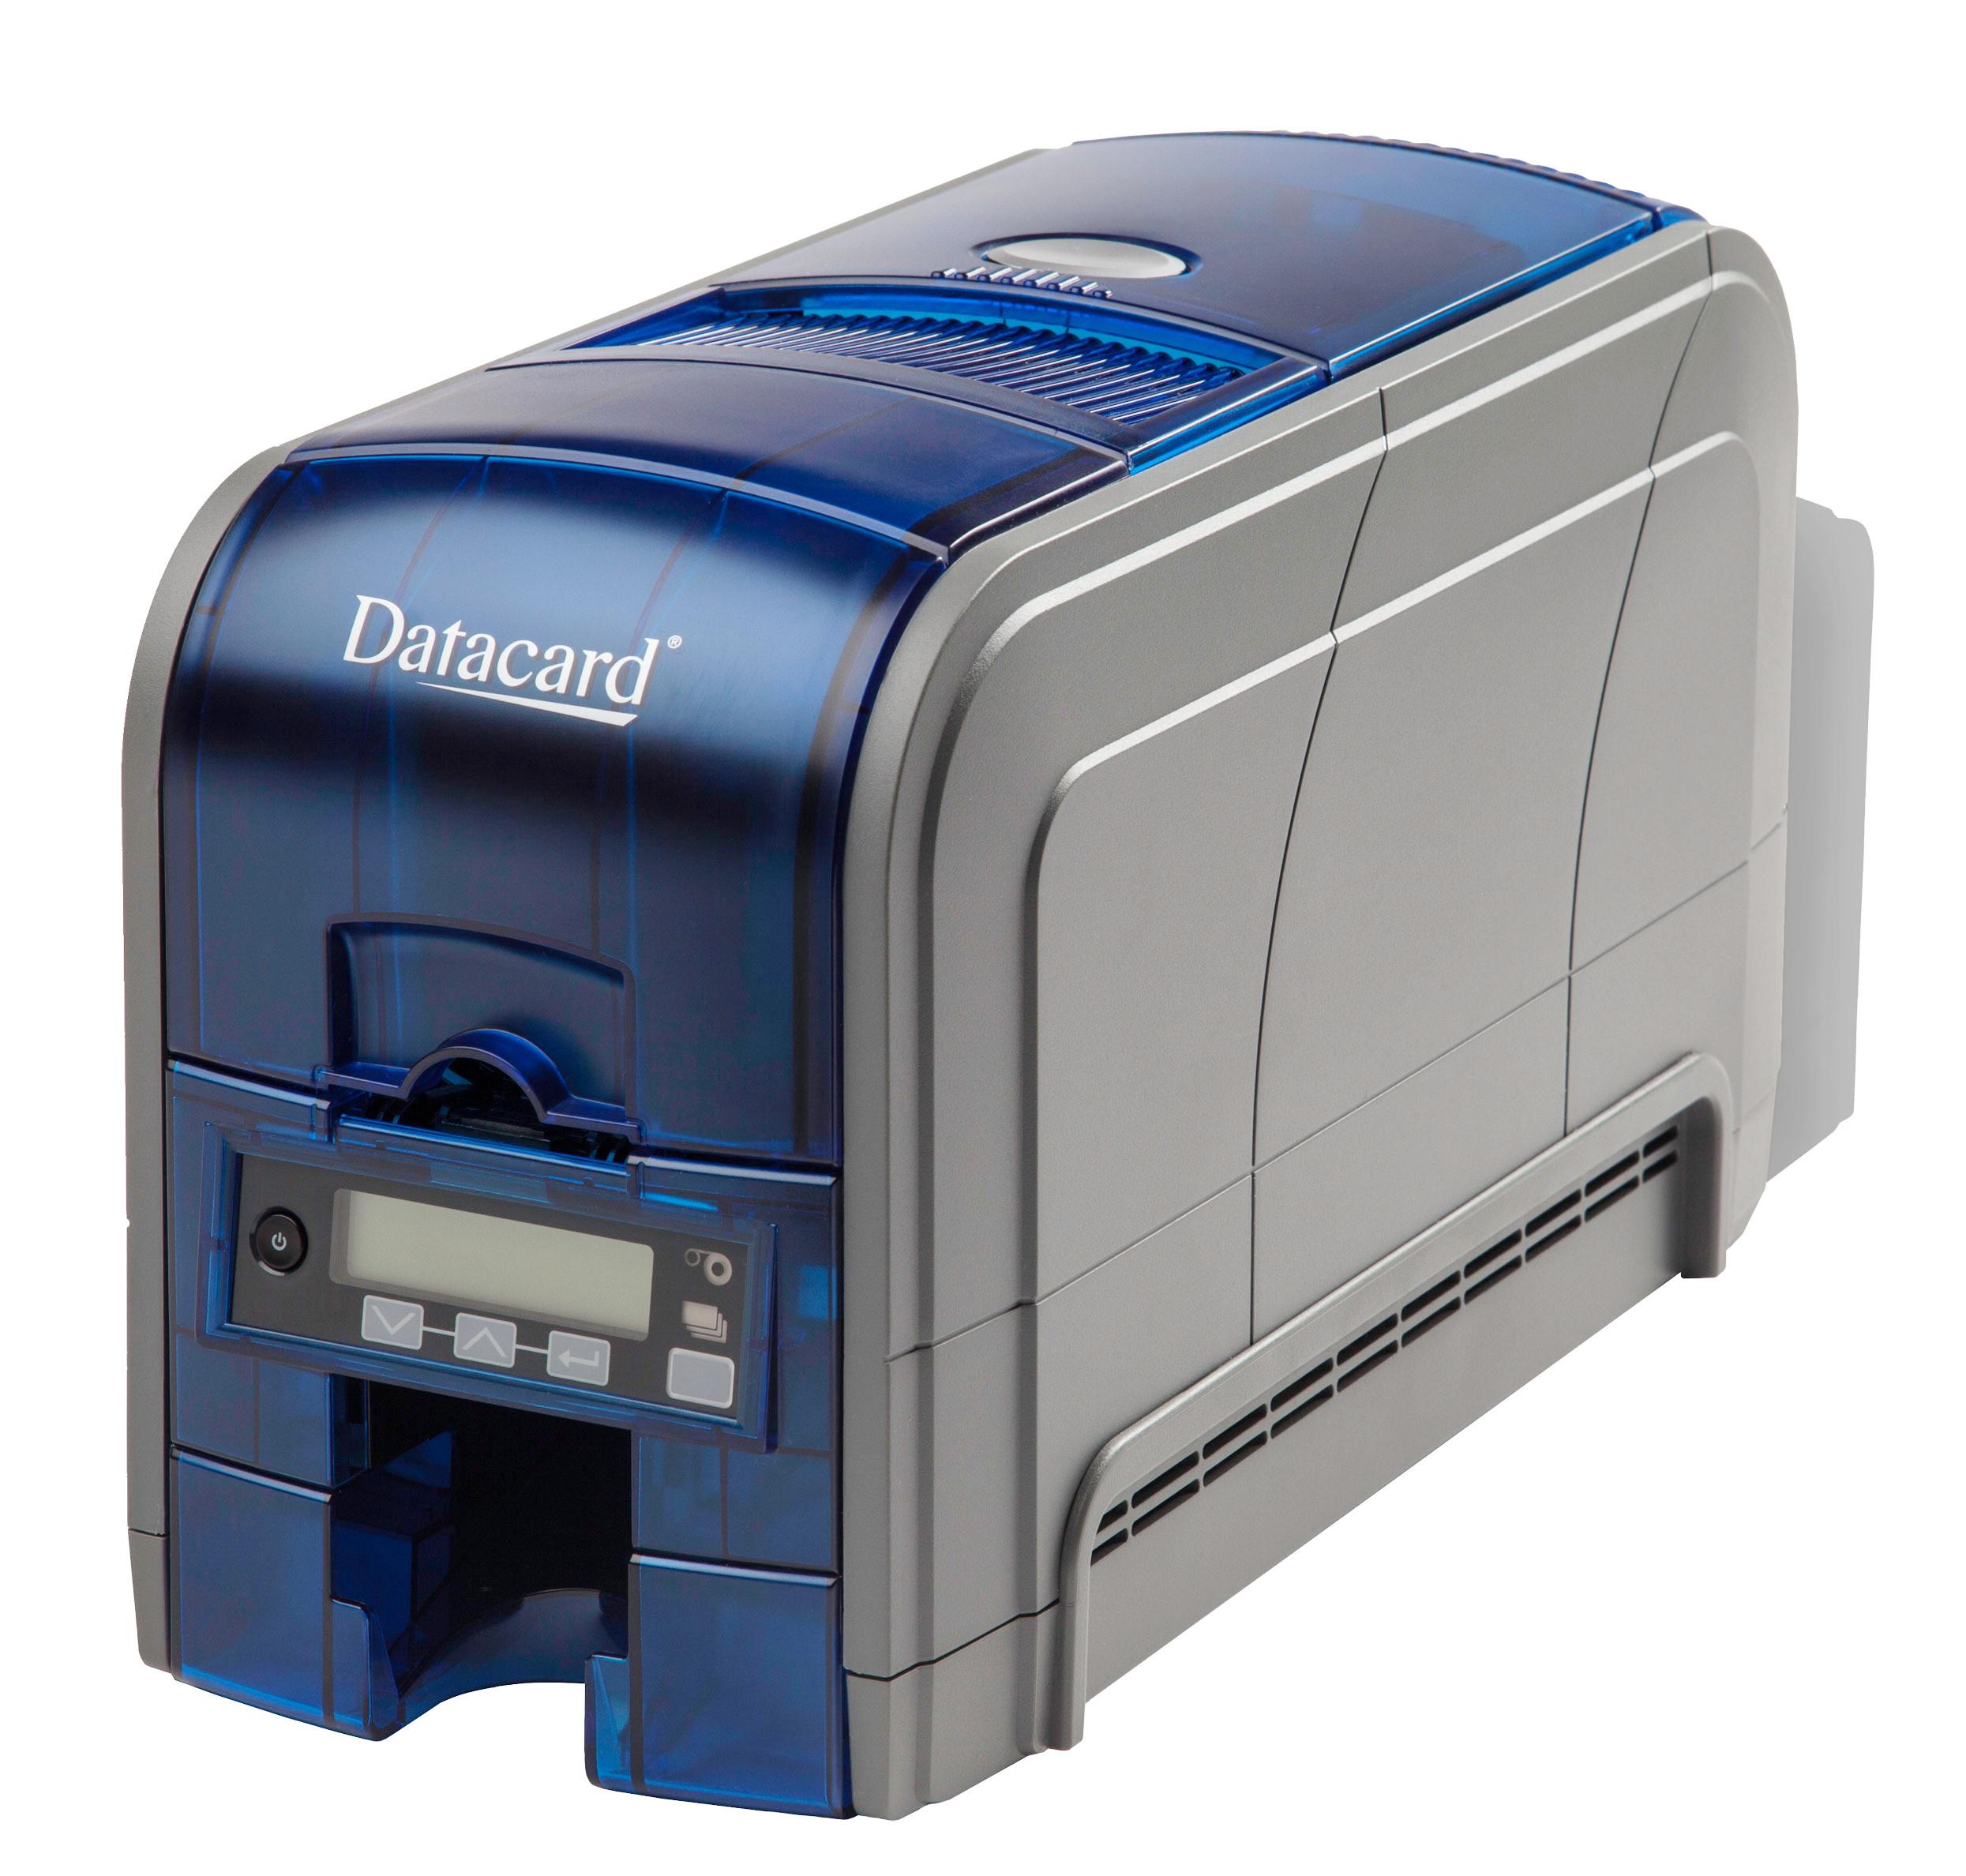 Datacard SD160 Single Sided Card Printer 510685-001